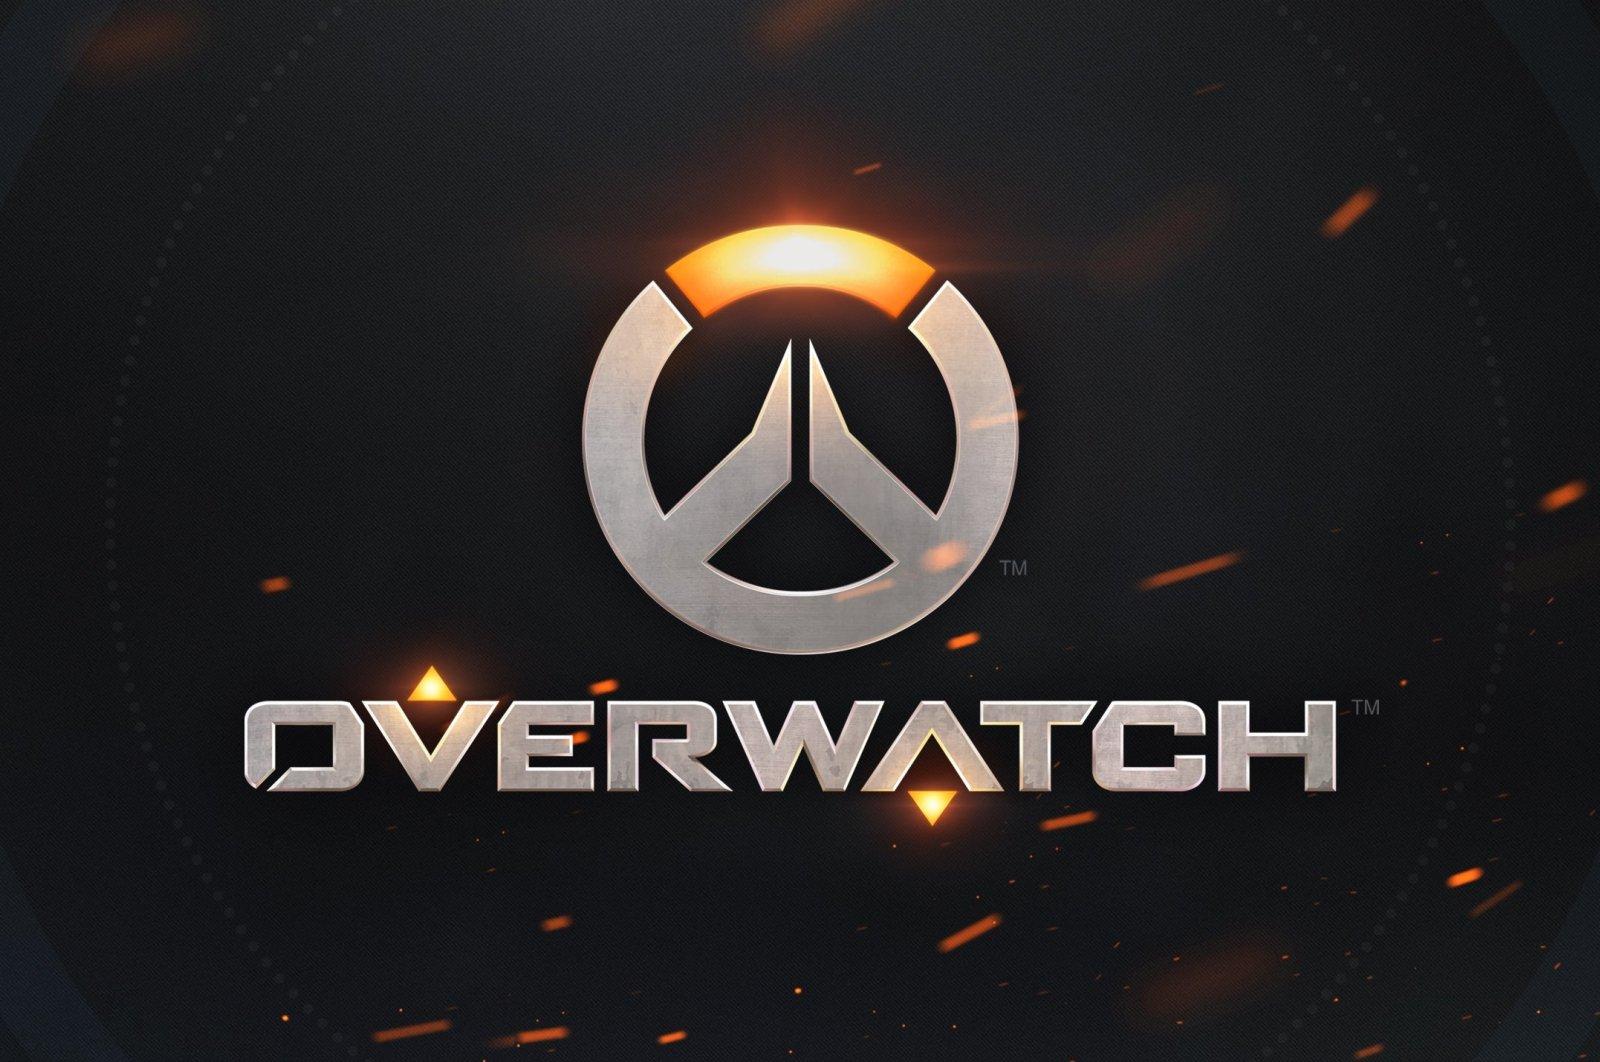 (Image credit: Activision Blizzard Inc.)